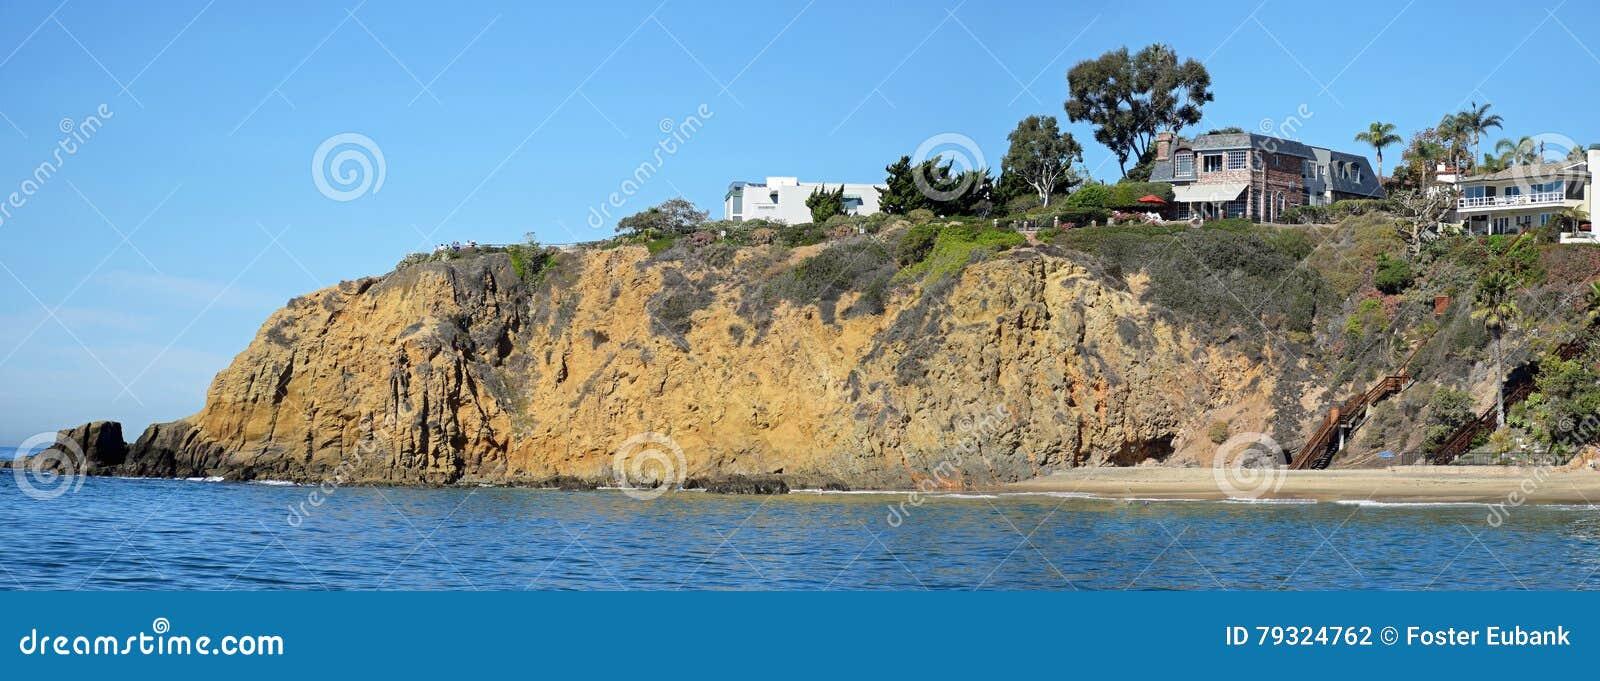 Rocky shoreline near Crescent Bay, Laguna Beach, California.